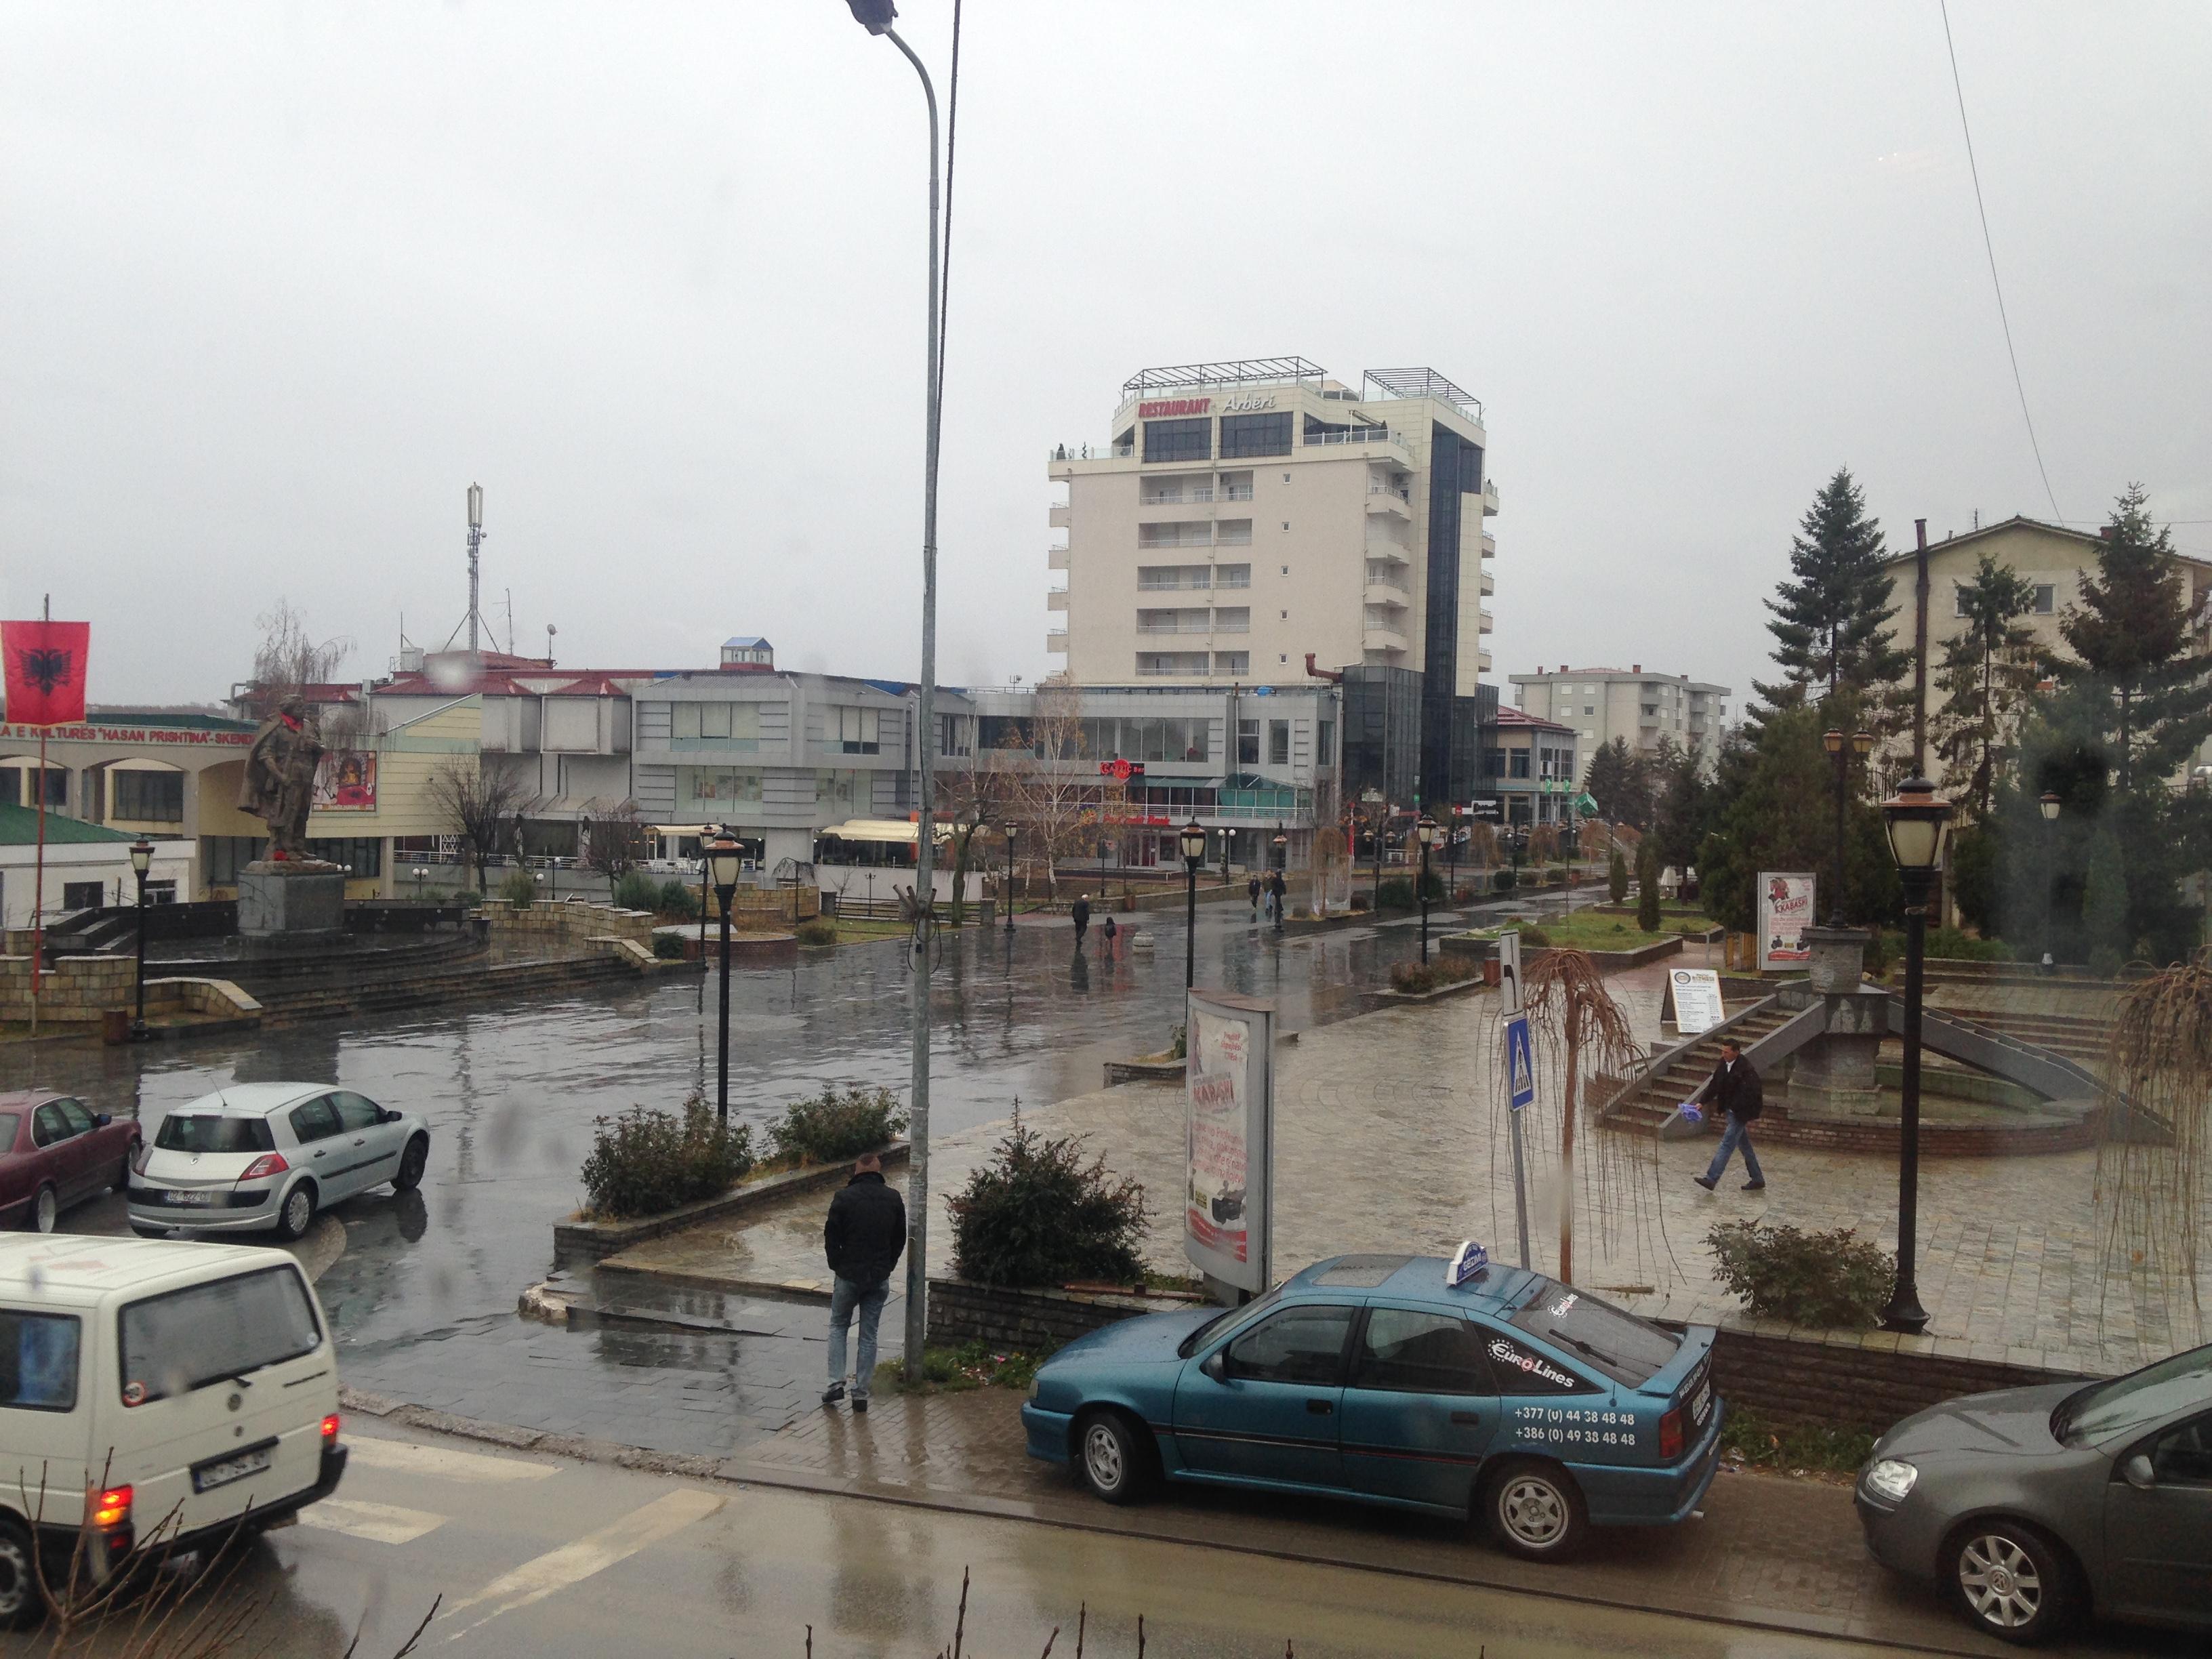 Srbica